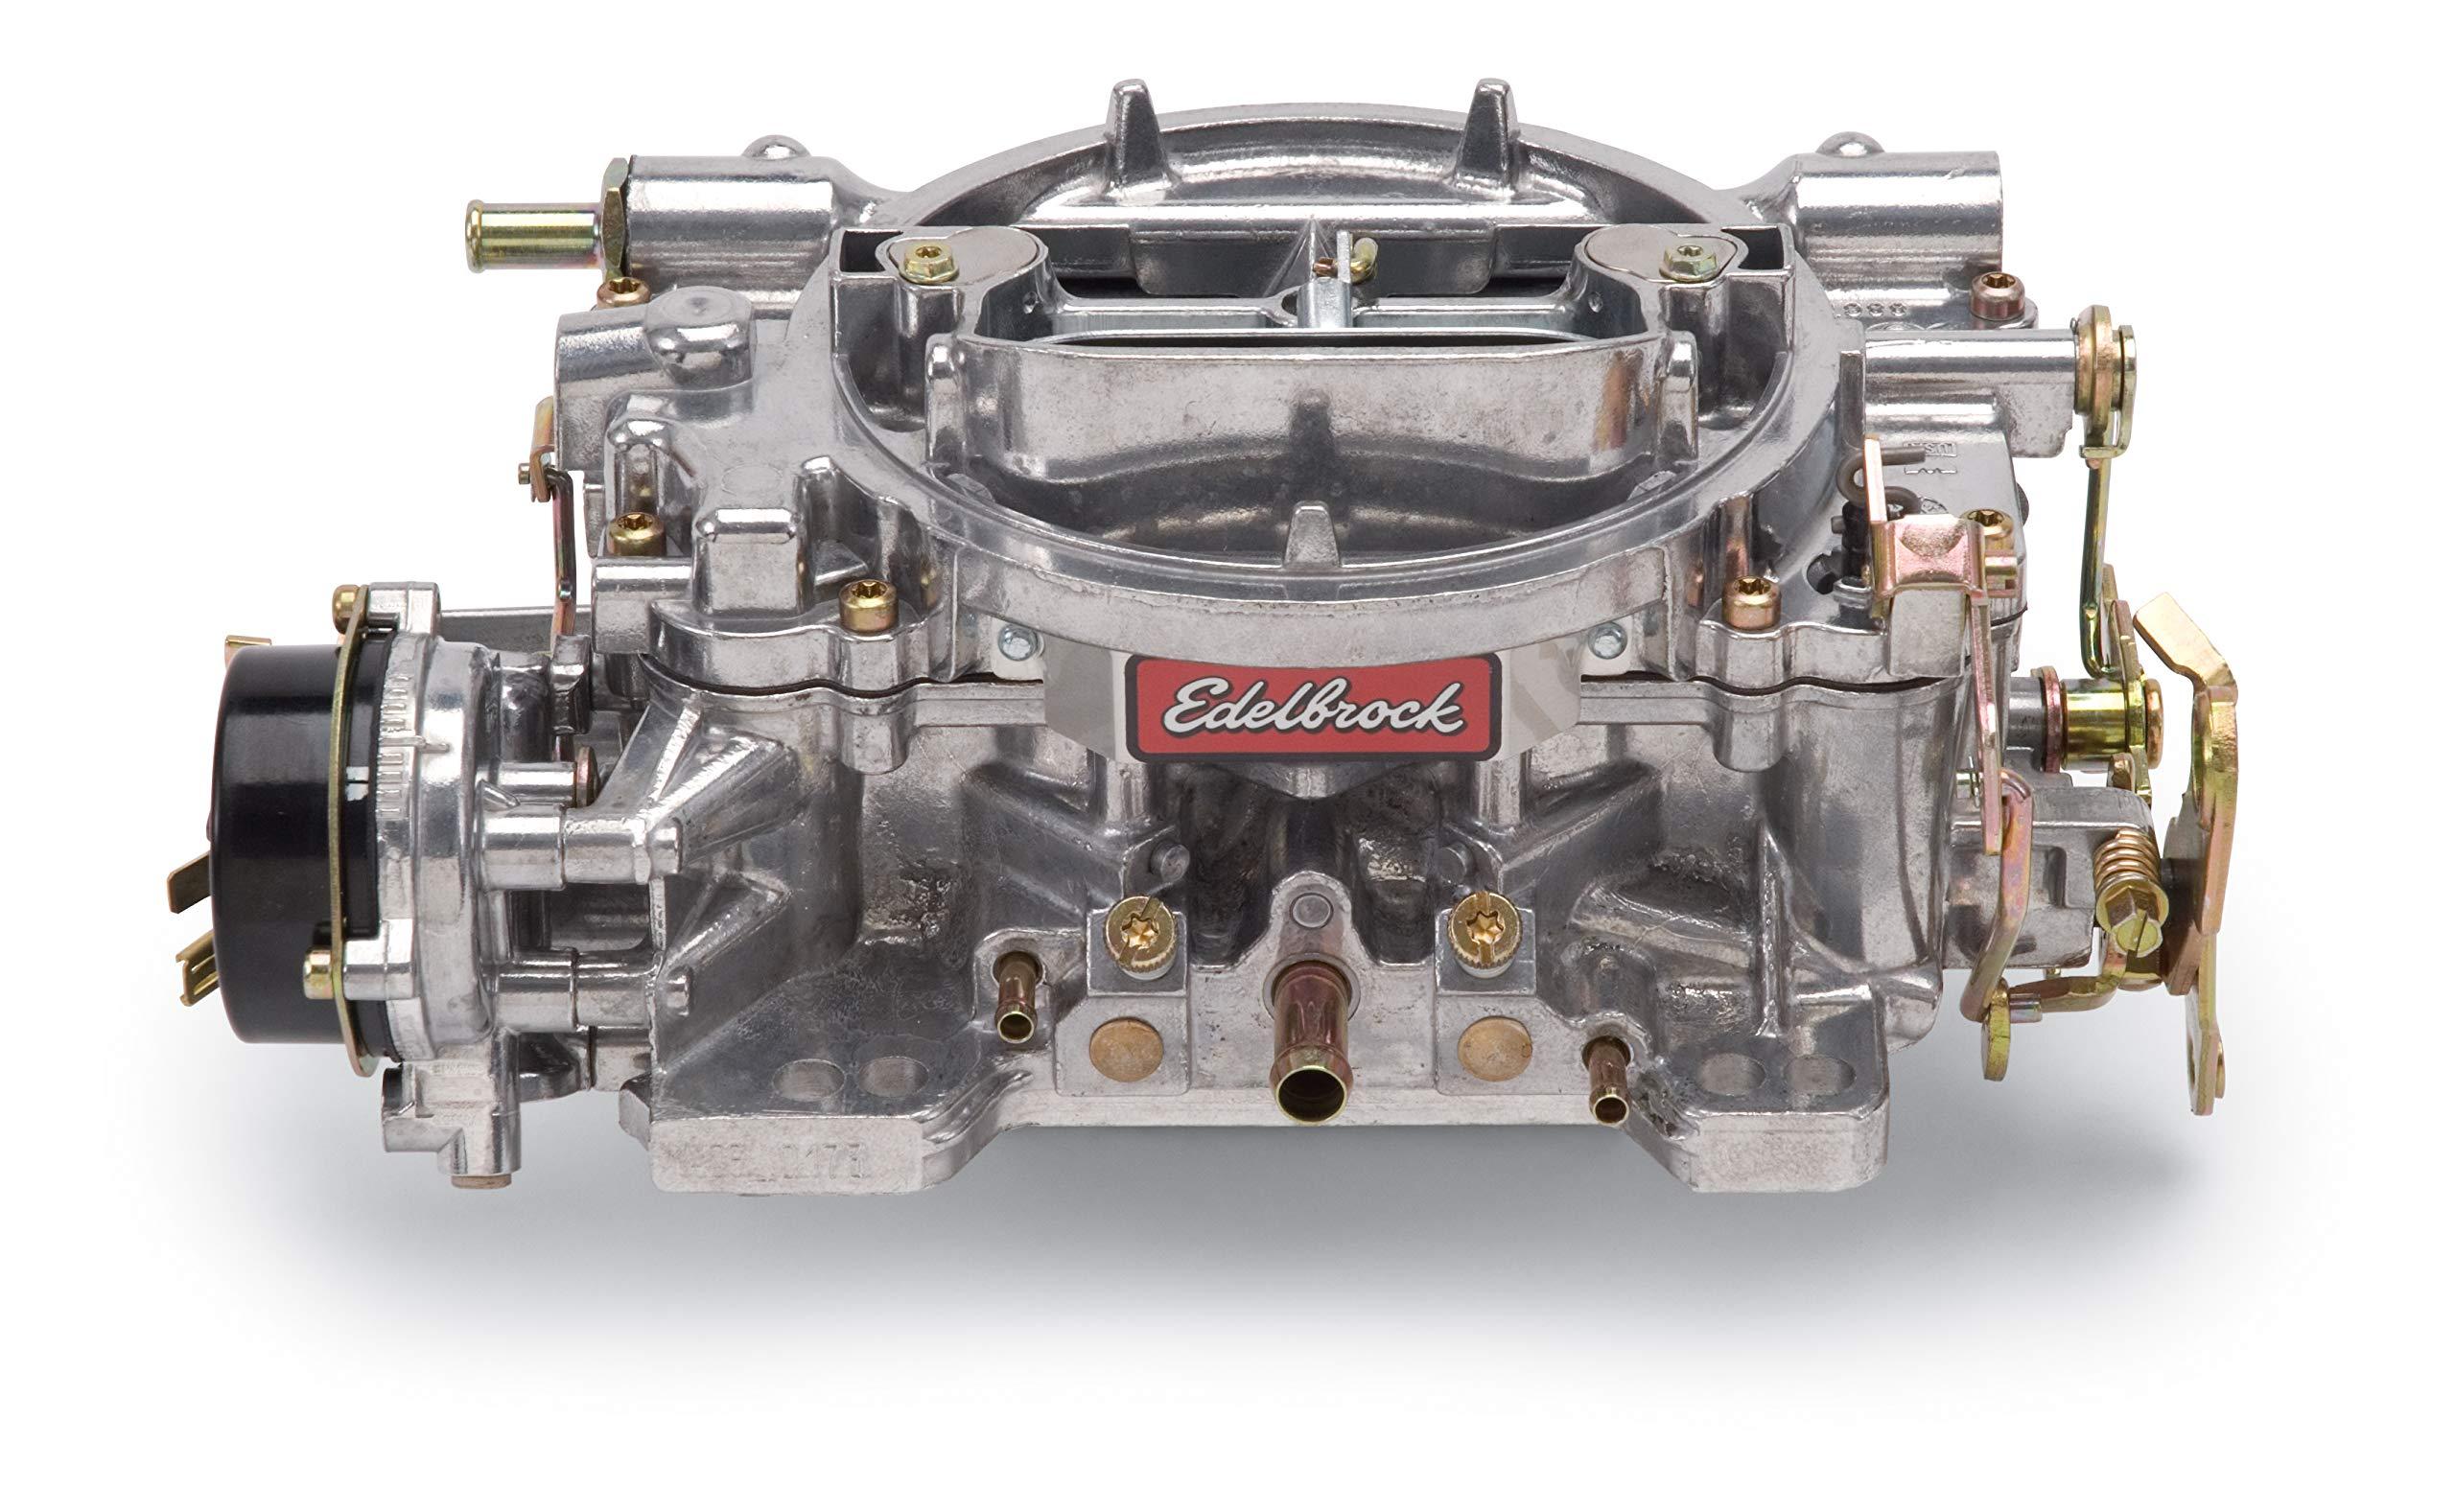 Edelbrock 1406 Performer 600 CFM Square Bore 4-Barrel Air Valve Secondary Electric Choke Carburetor by Edelbrock